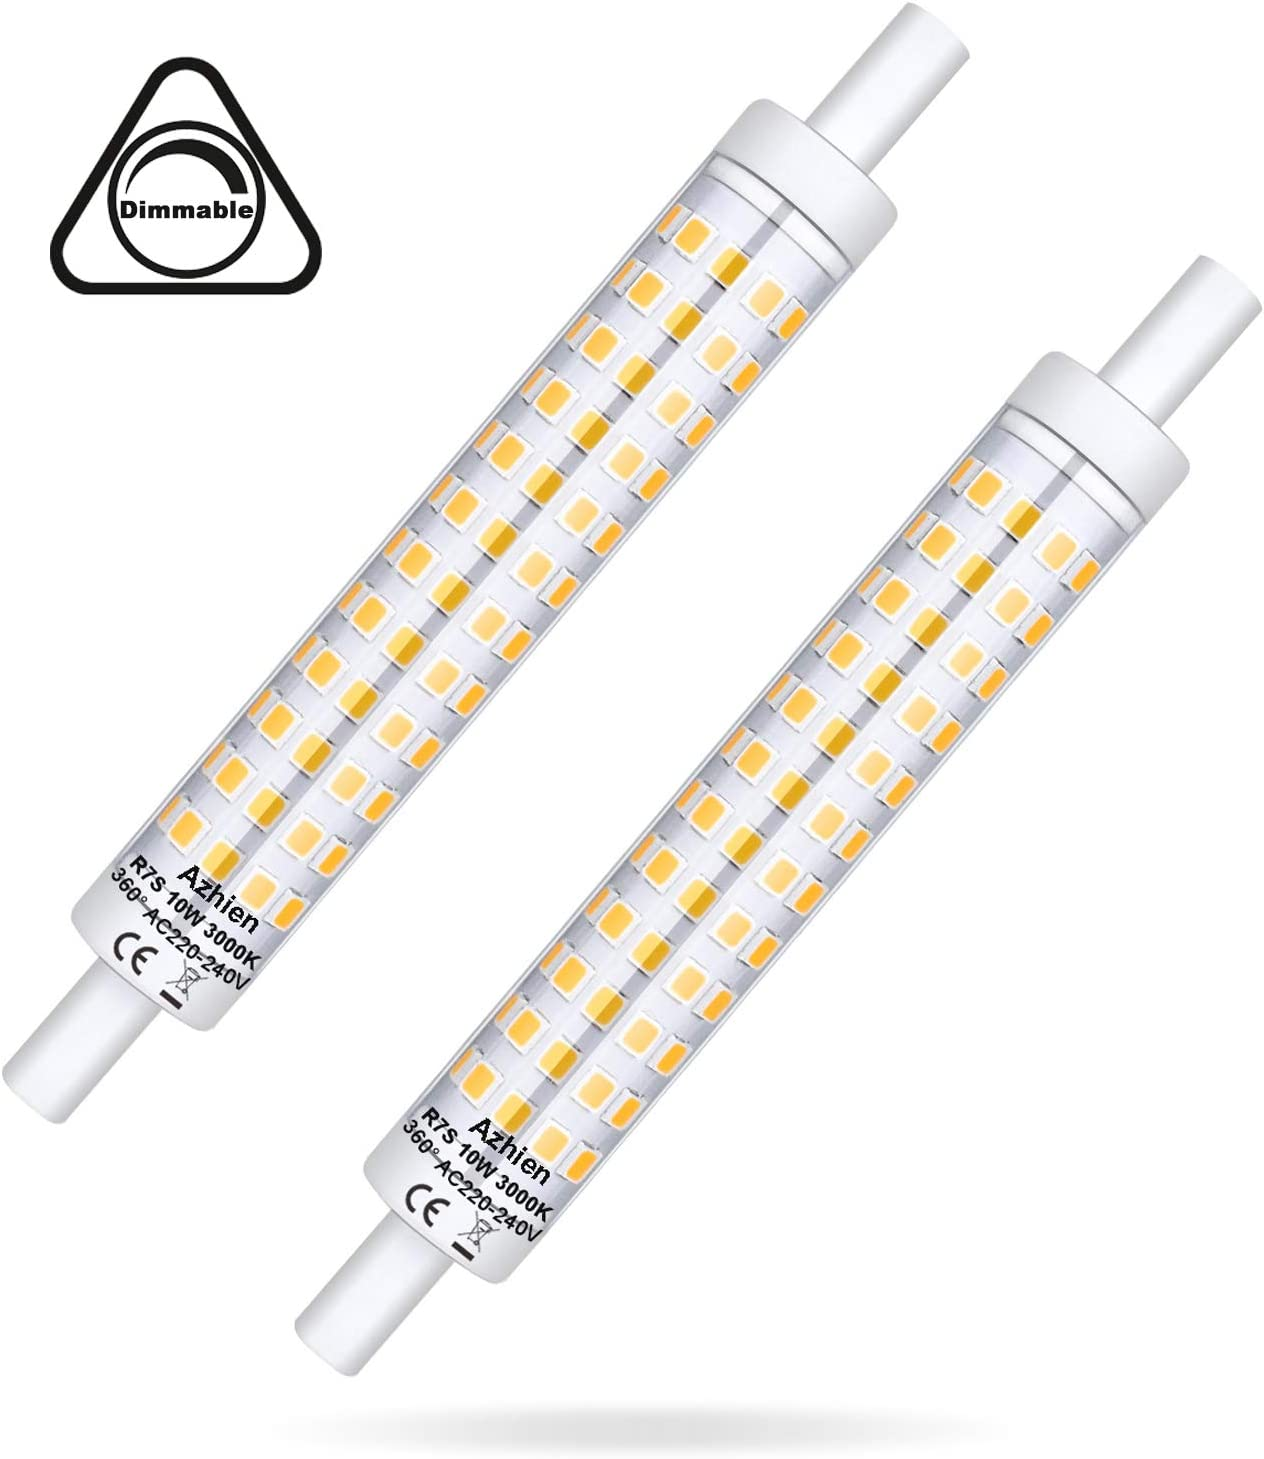 R7S LED Regulable 118mm 10W, Azhien R7S 118mm Doble Extremo J118 Lineal Reflector Bombilla, Luz Blanca Cálida 3000K,Equivalente a 48W 60W 75W Lámpara Halógena, 230V AC,1000LM, 360 grados, pack de 2